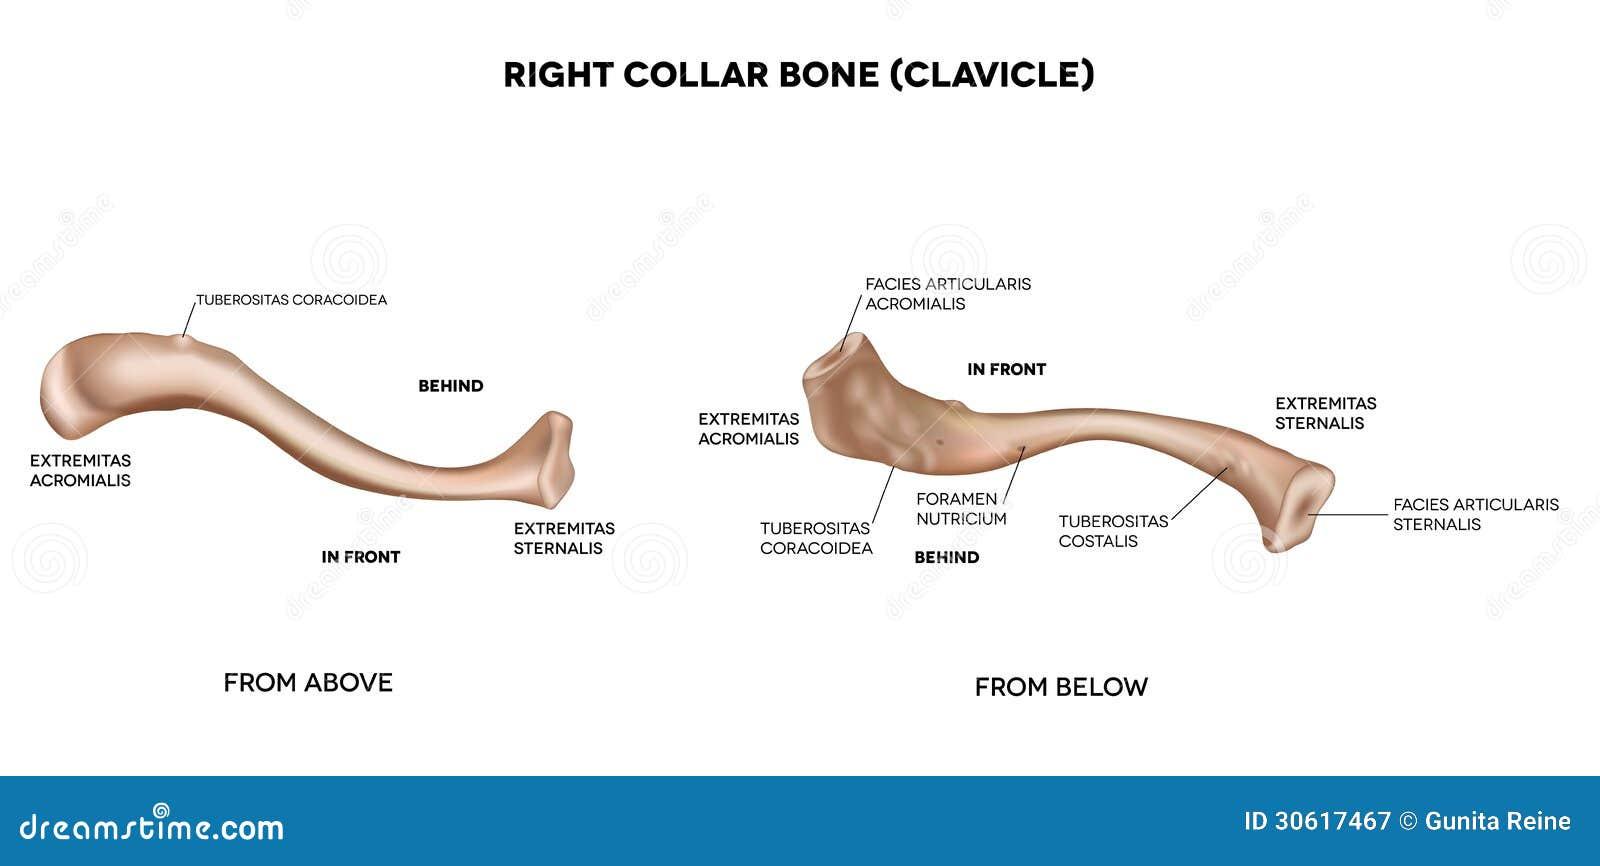 Schlüsselbein - Clavicula || Med-koM